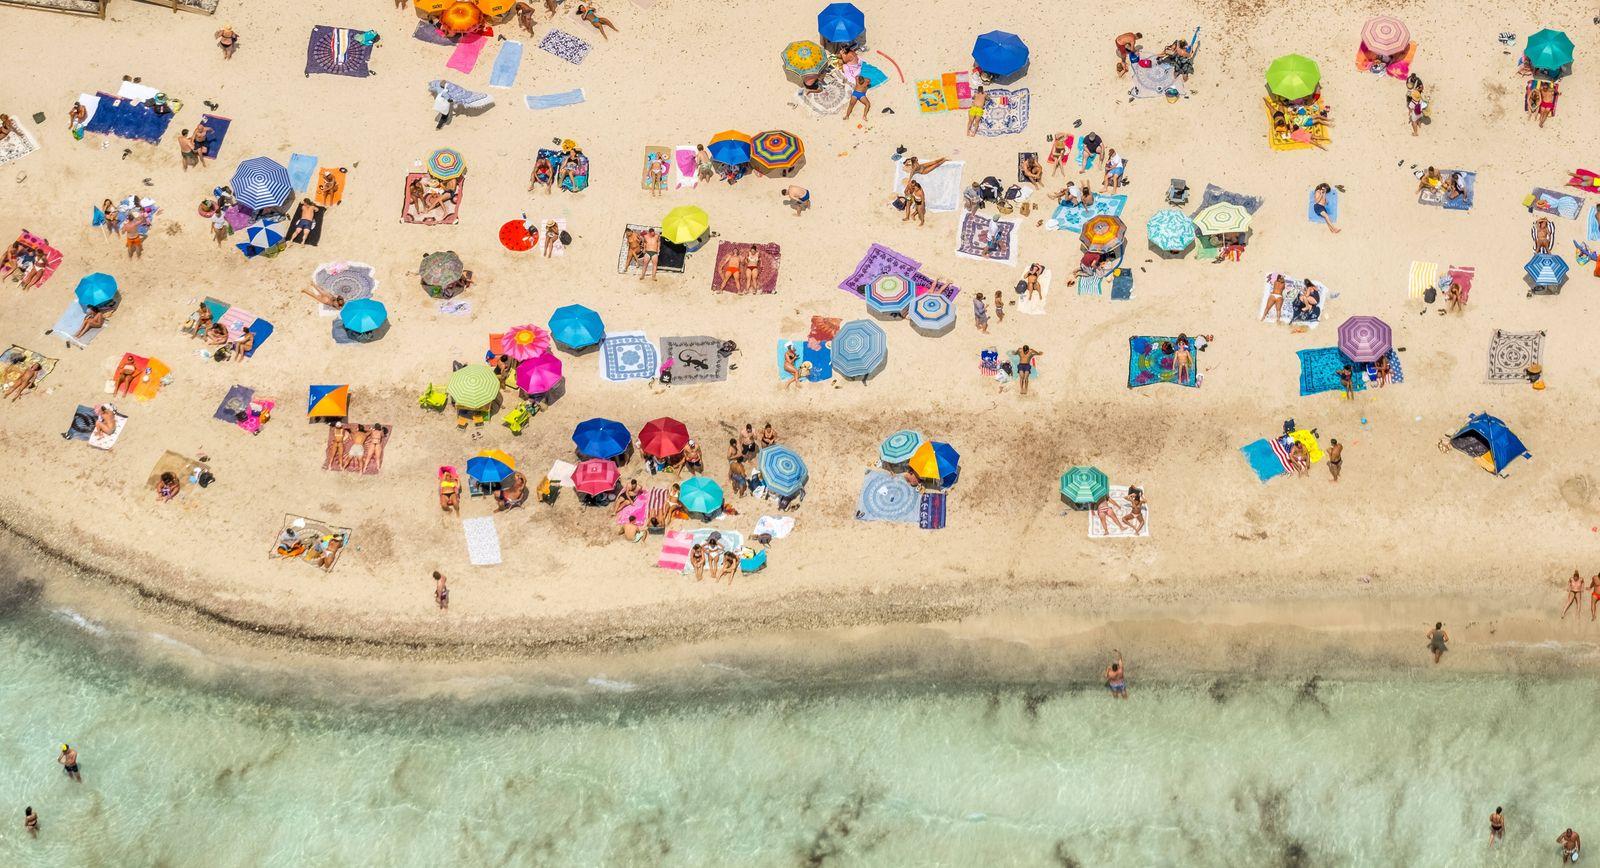 Luftbild, Strandleben am Platja Des Trenc, Sandstrand, Europa, Baleares, Spanien !ACHTUNGxMINDESTHONORARx60xEURO! *** A